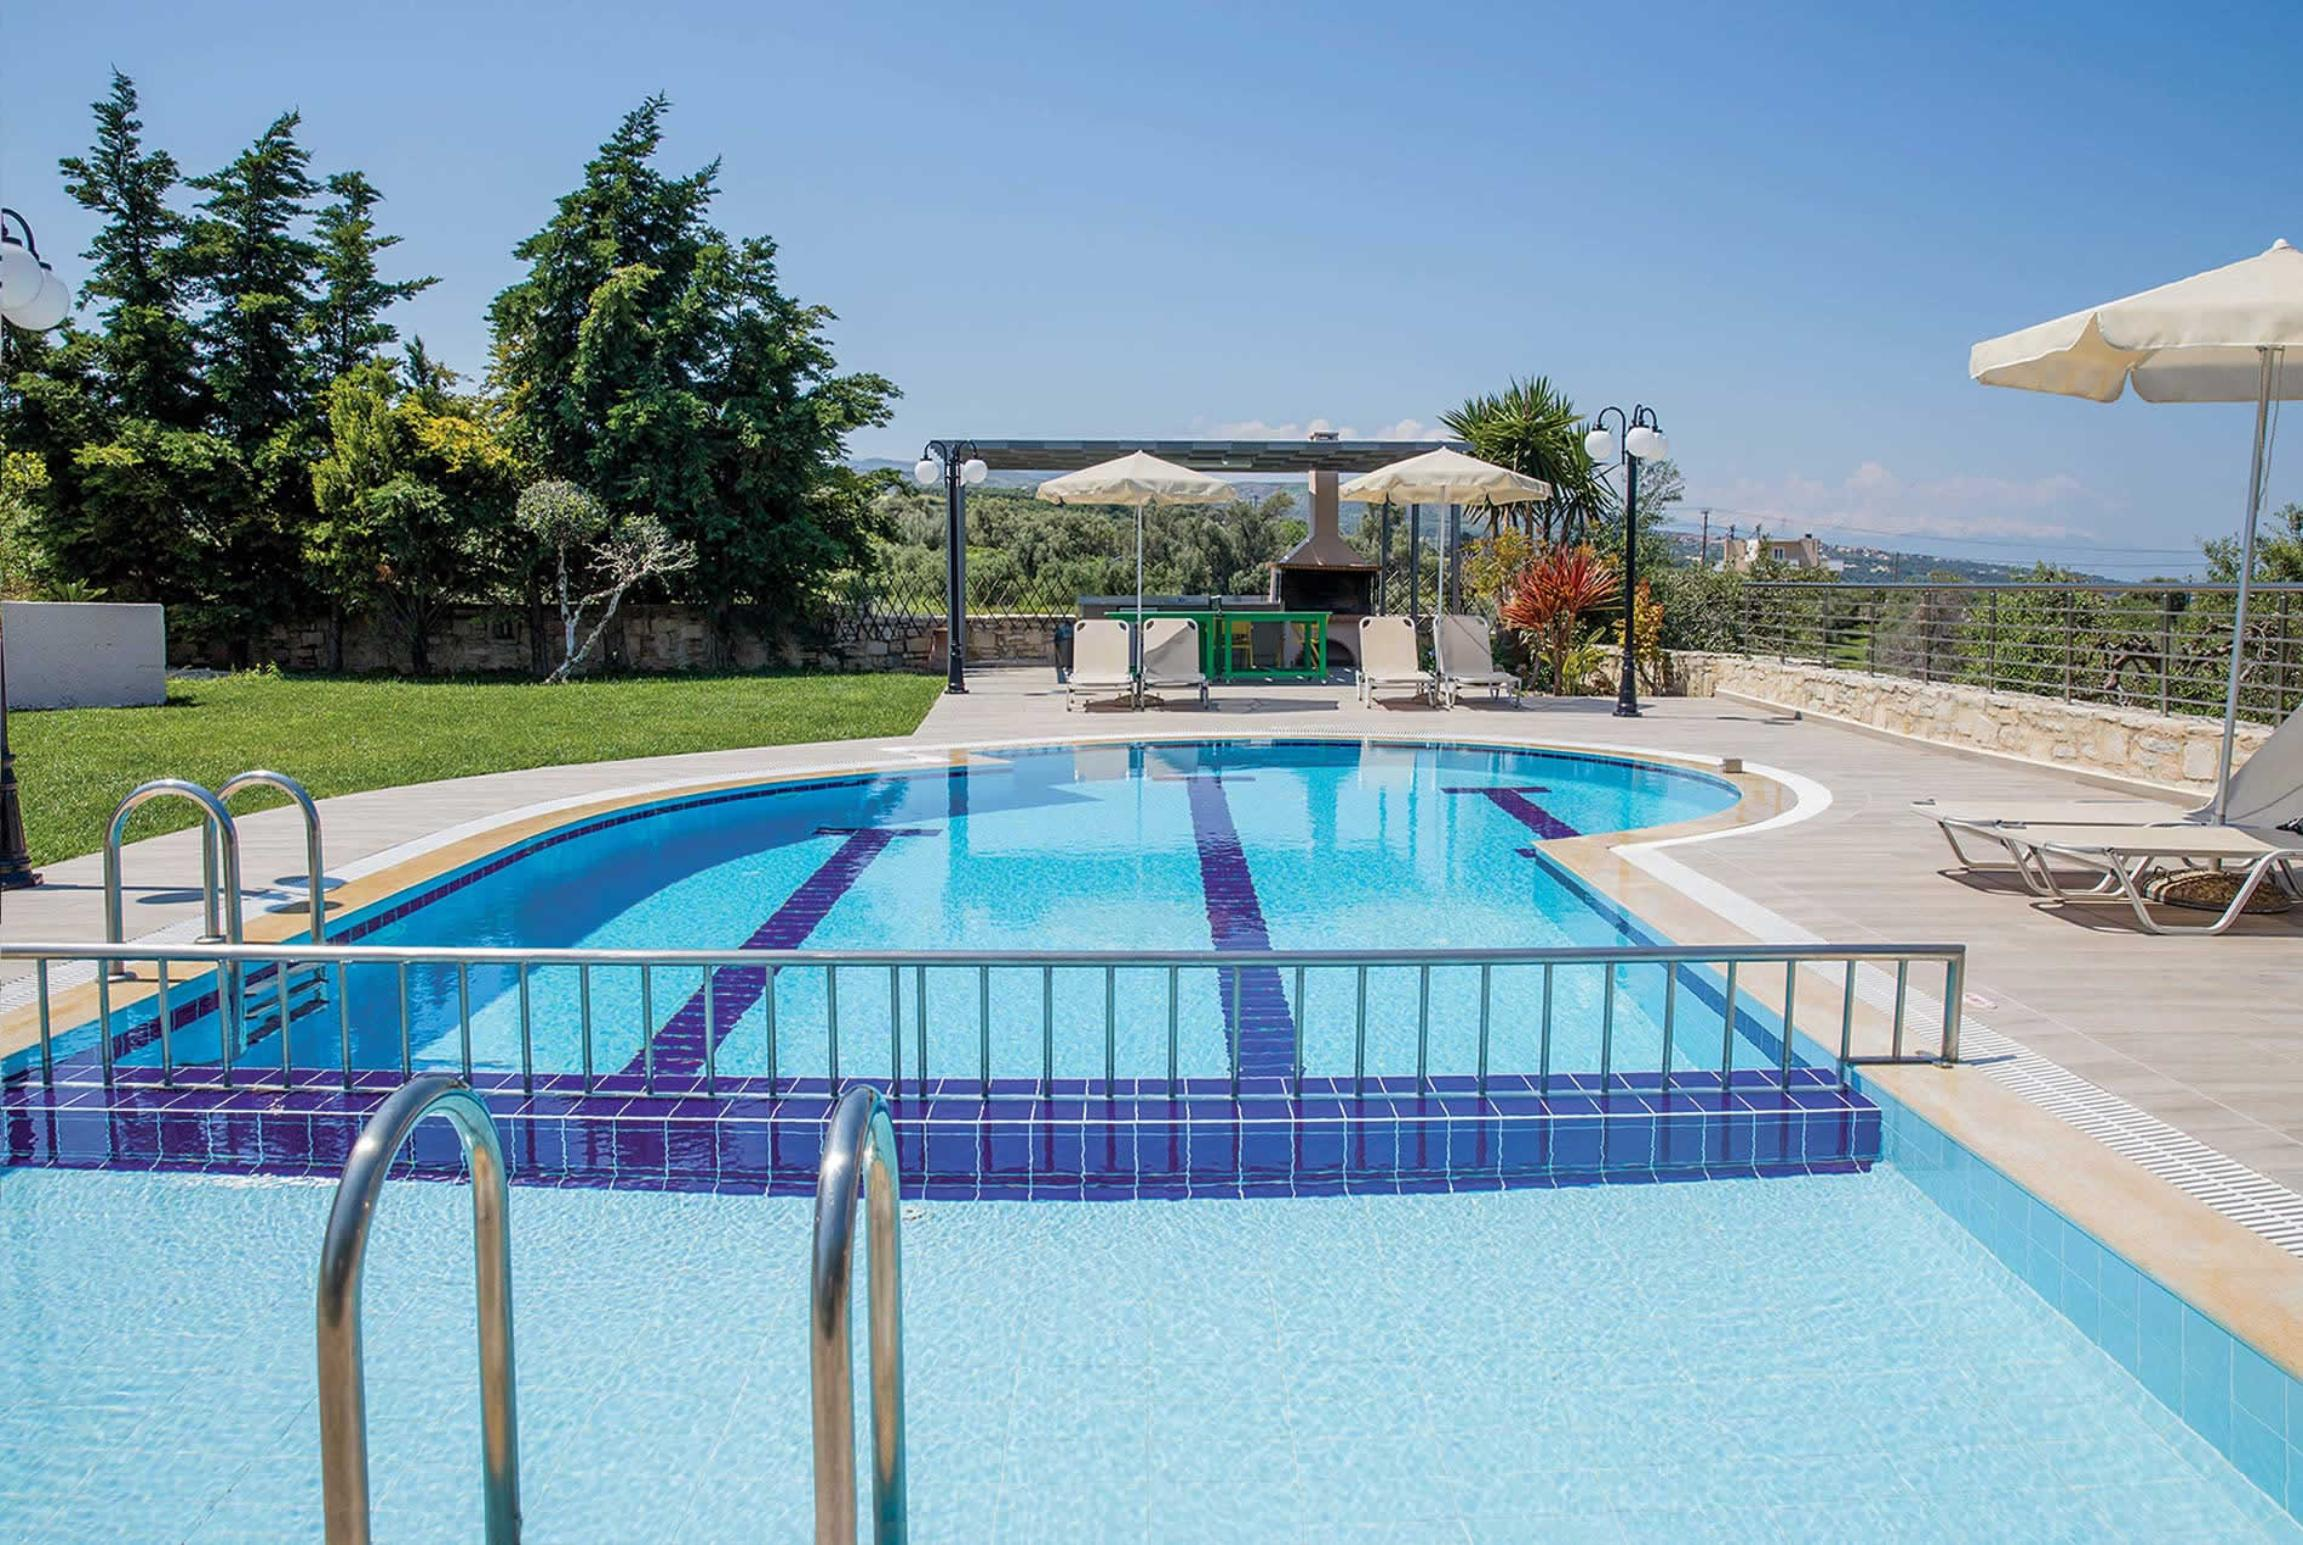 Ferienhaus Kyveli (2654321), Rethymno, Kreta Nordküste, Kreta, Griechenland, Bild 12